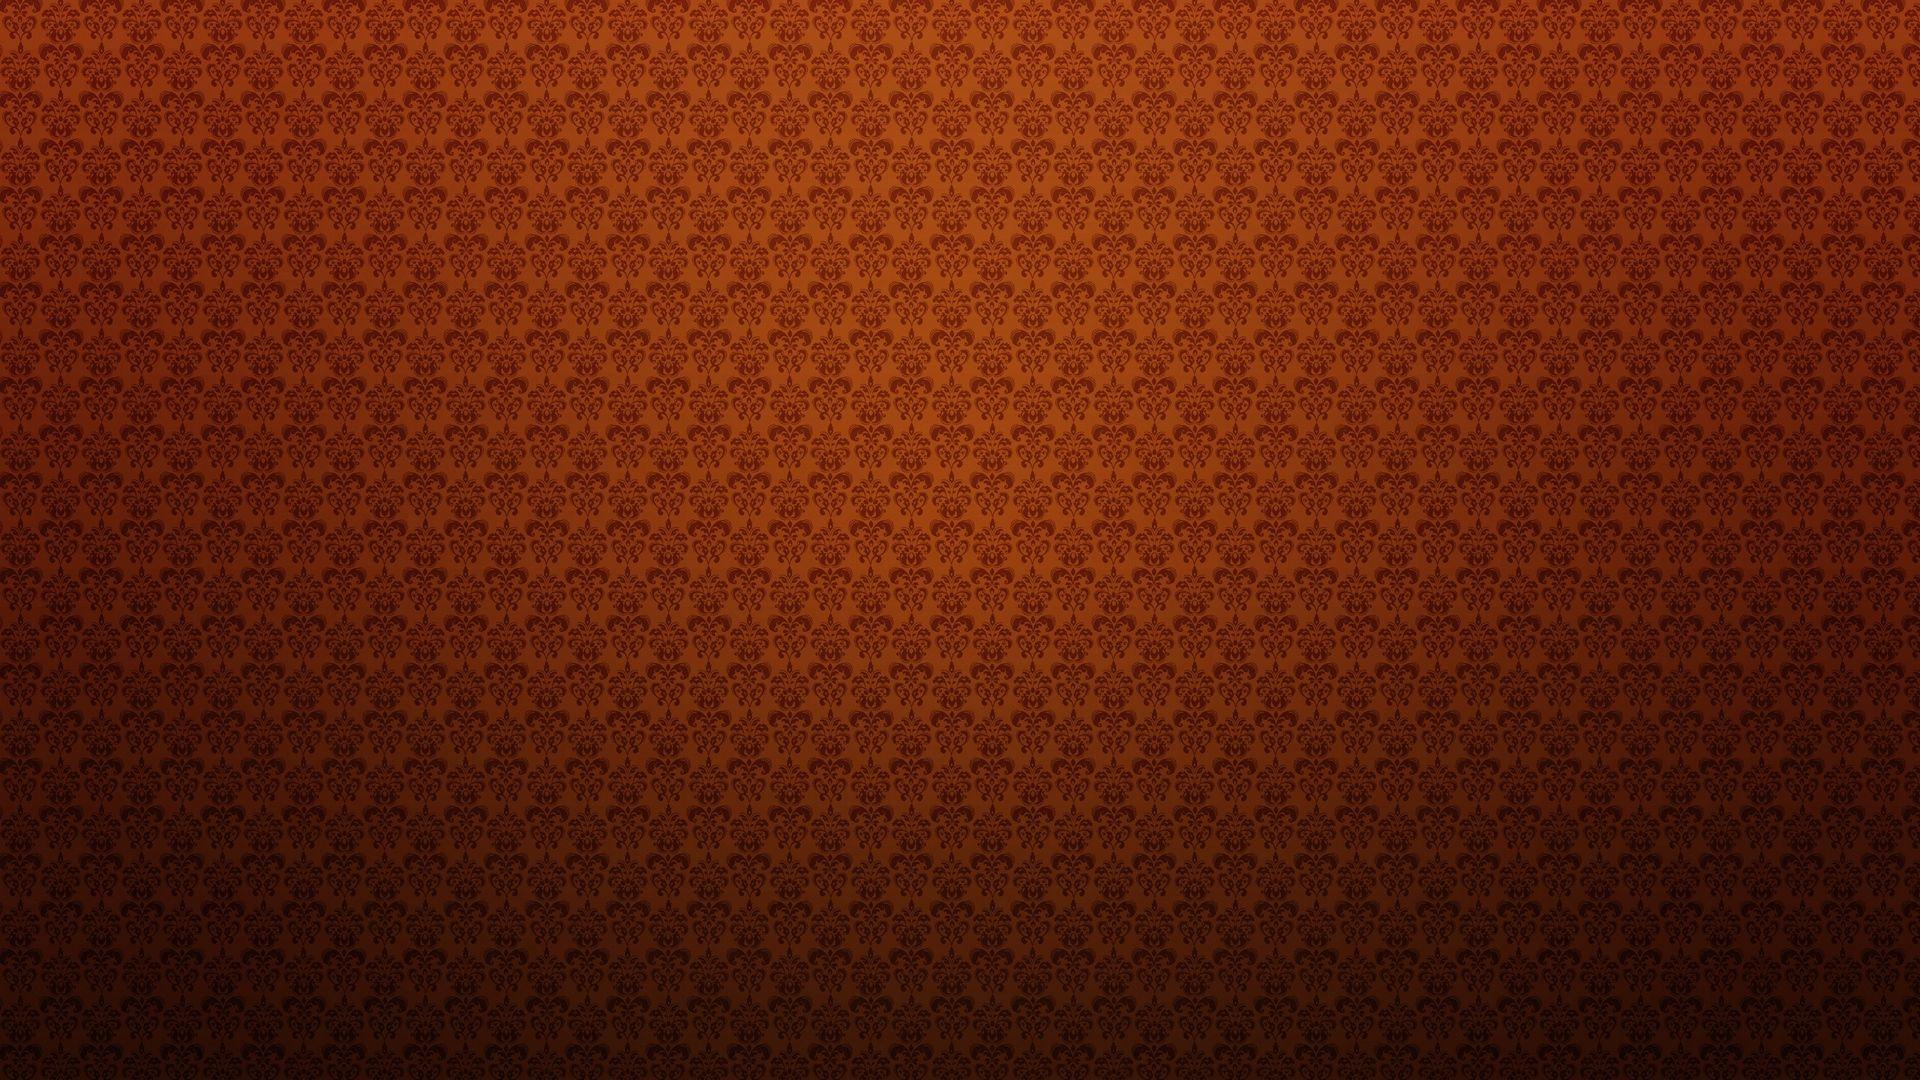 Best Background For Website computer wallpaper